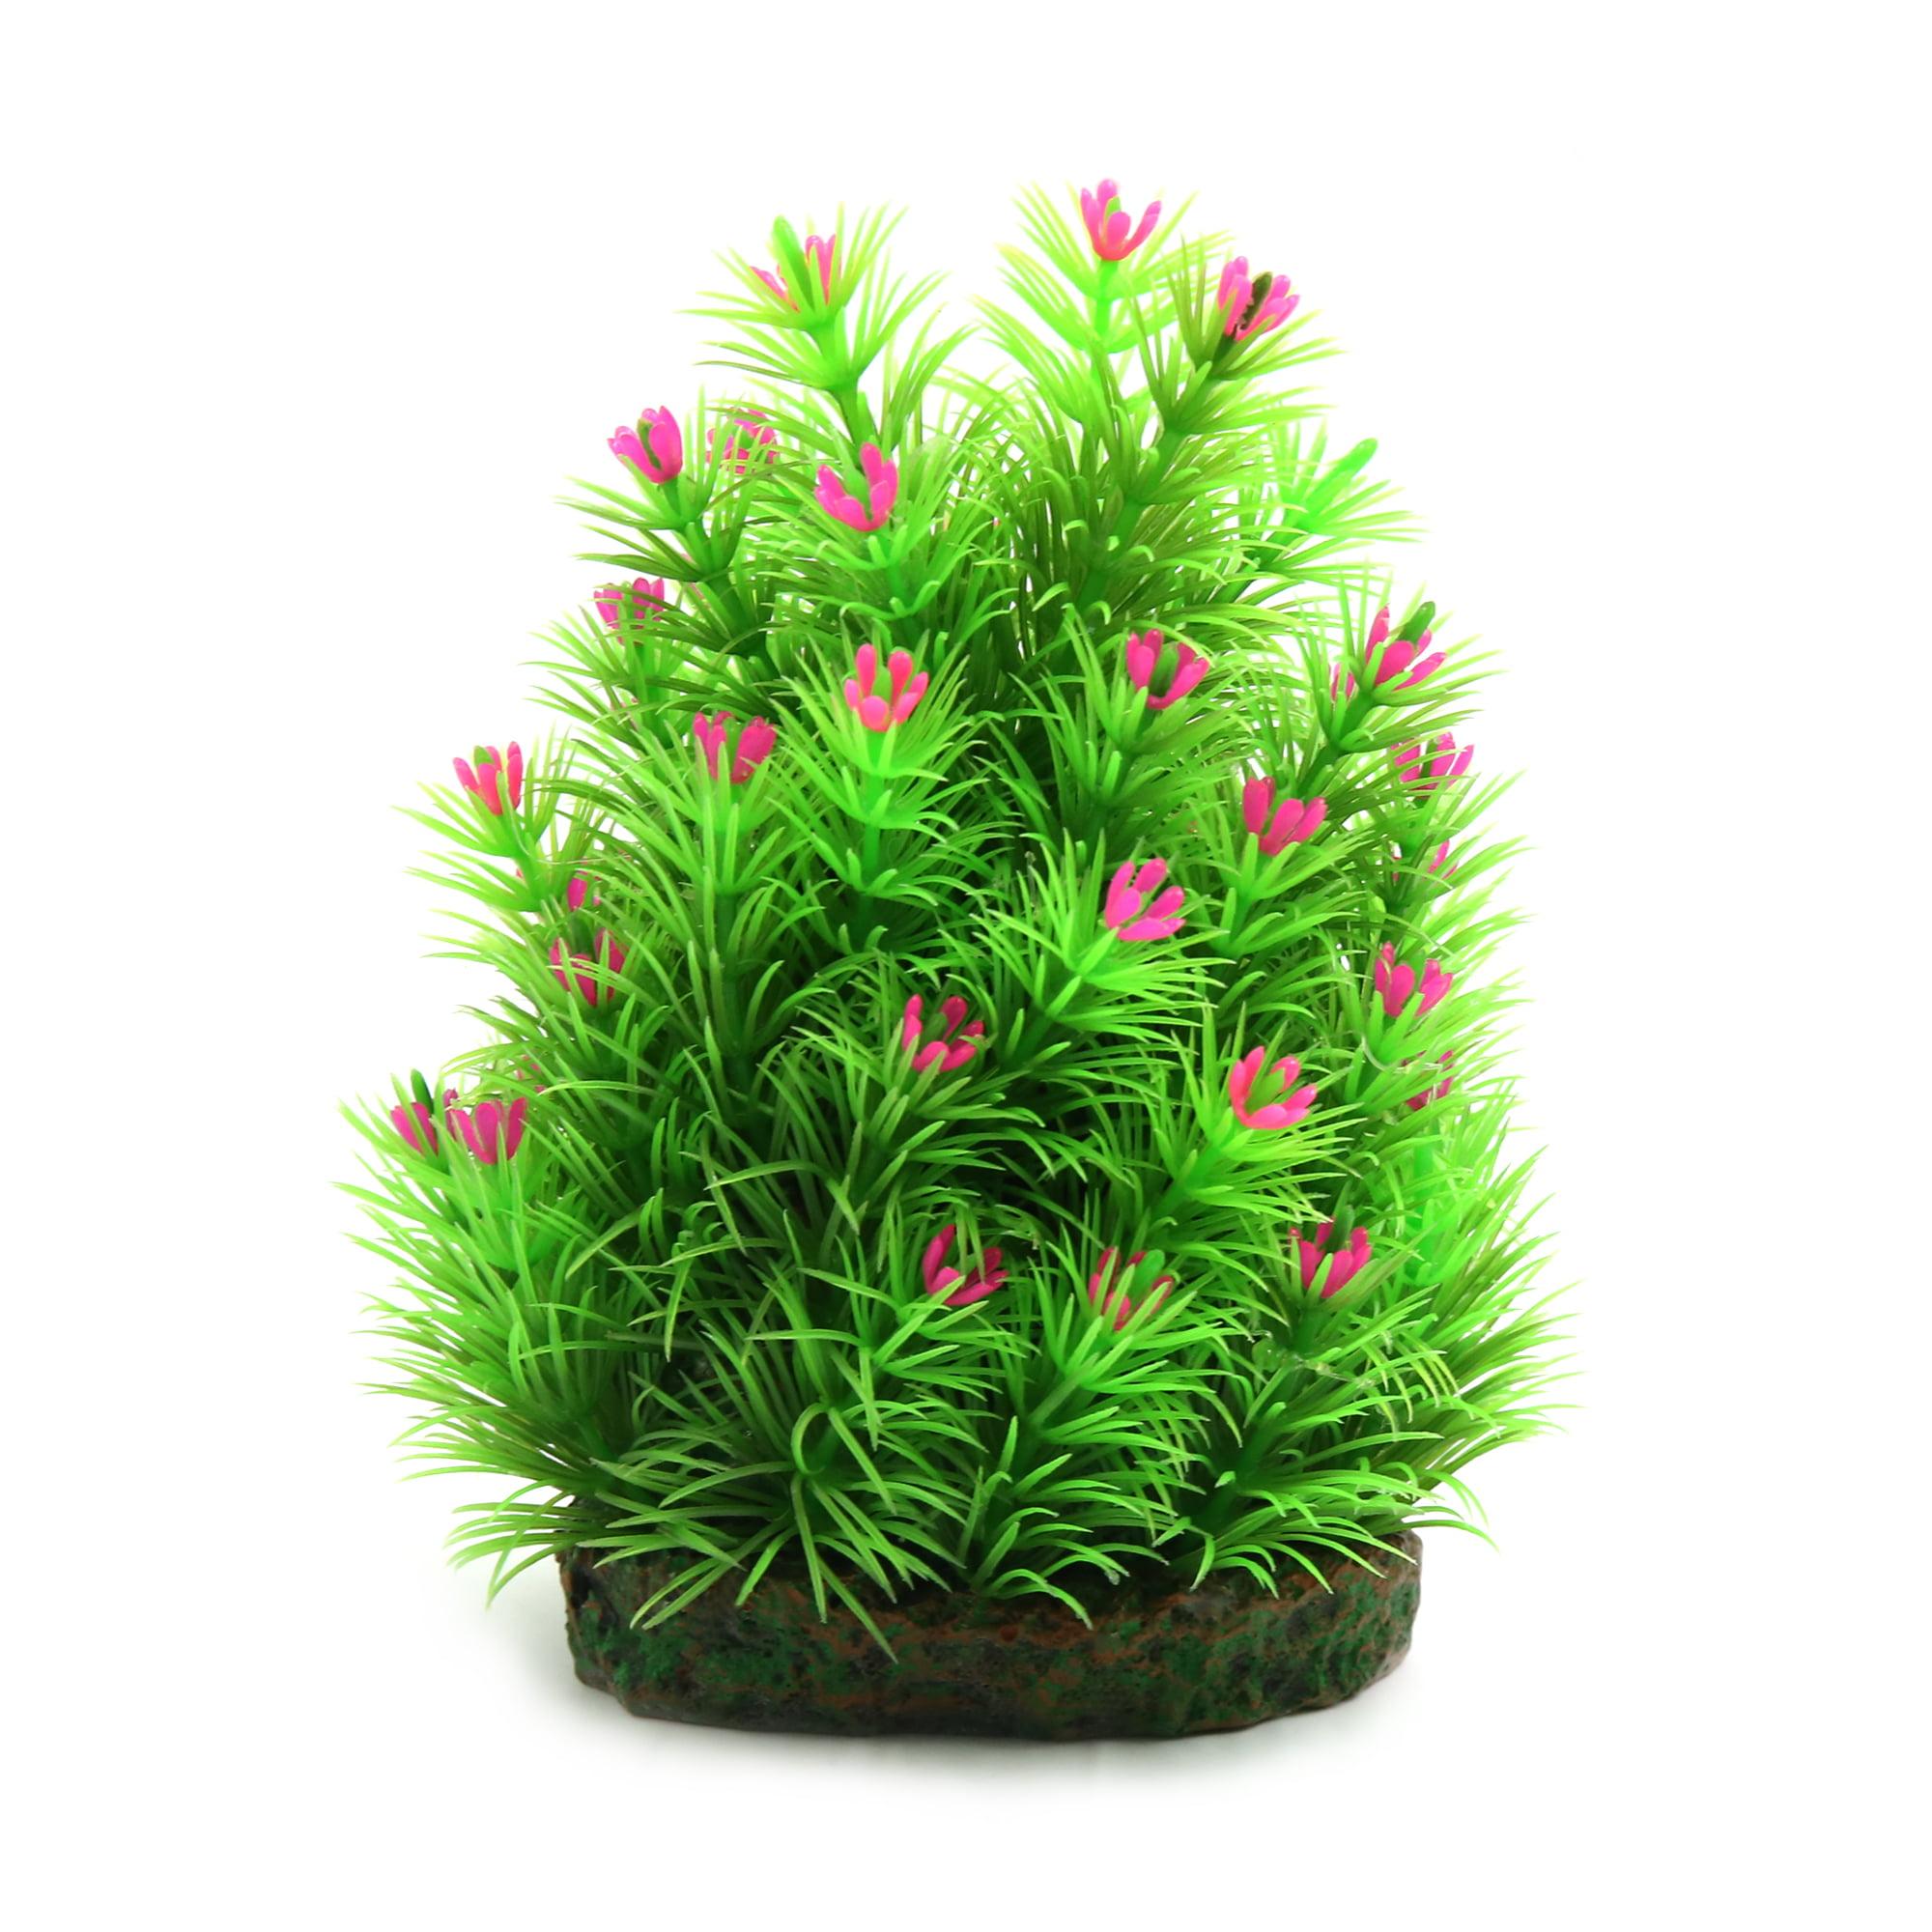 5.7 Inch Pink Plastic Plant Terrarium Decor Habitat for Reptiles Amphibians by